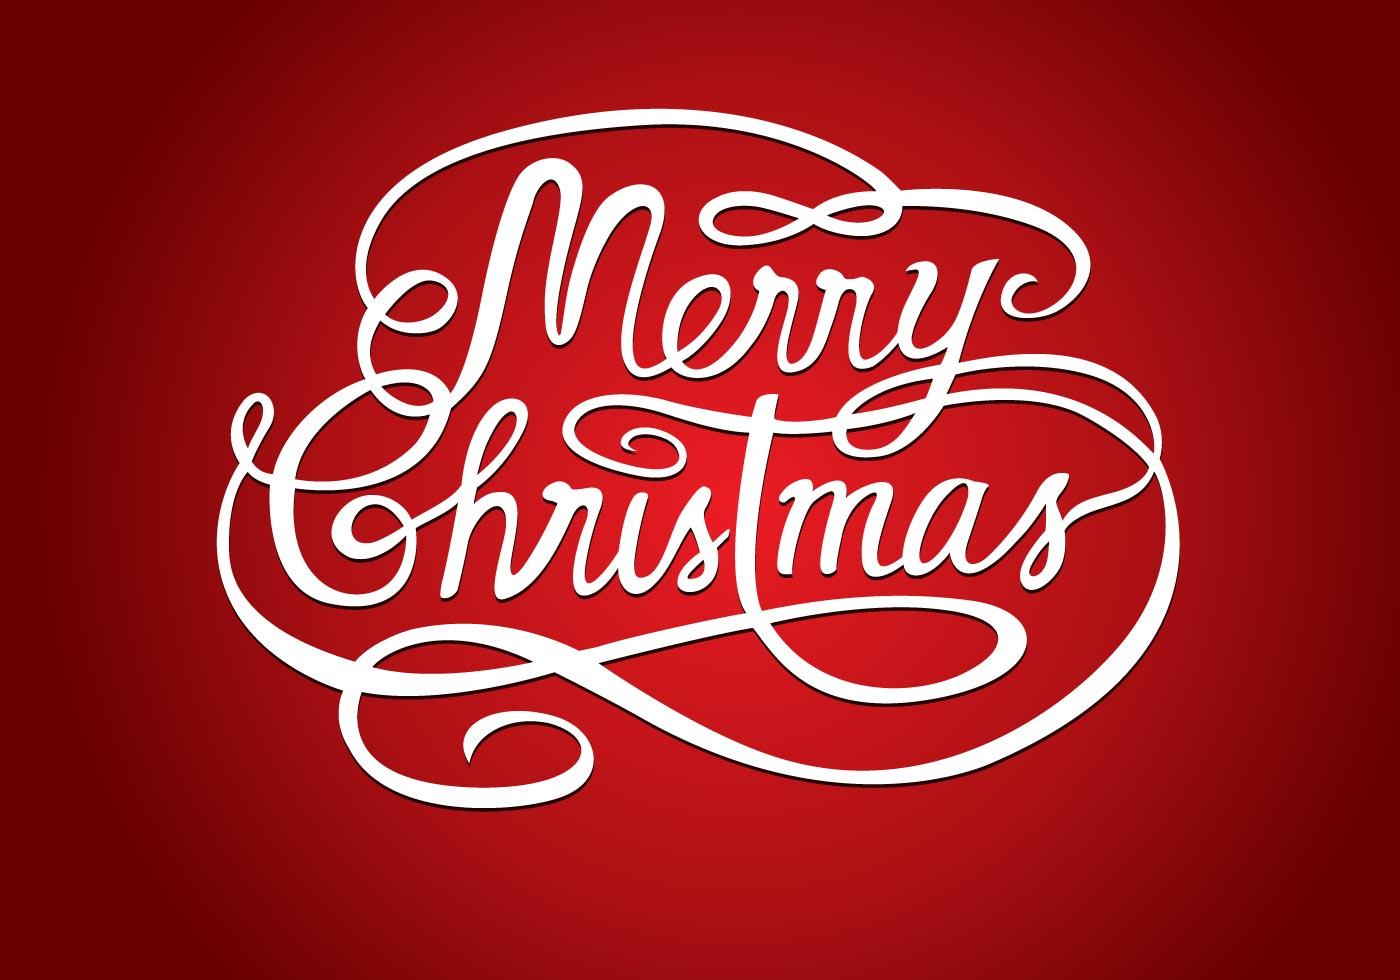 Merry Christmas Logo - Download Free Vector Art, Stock ...